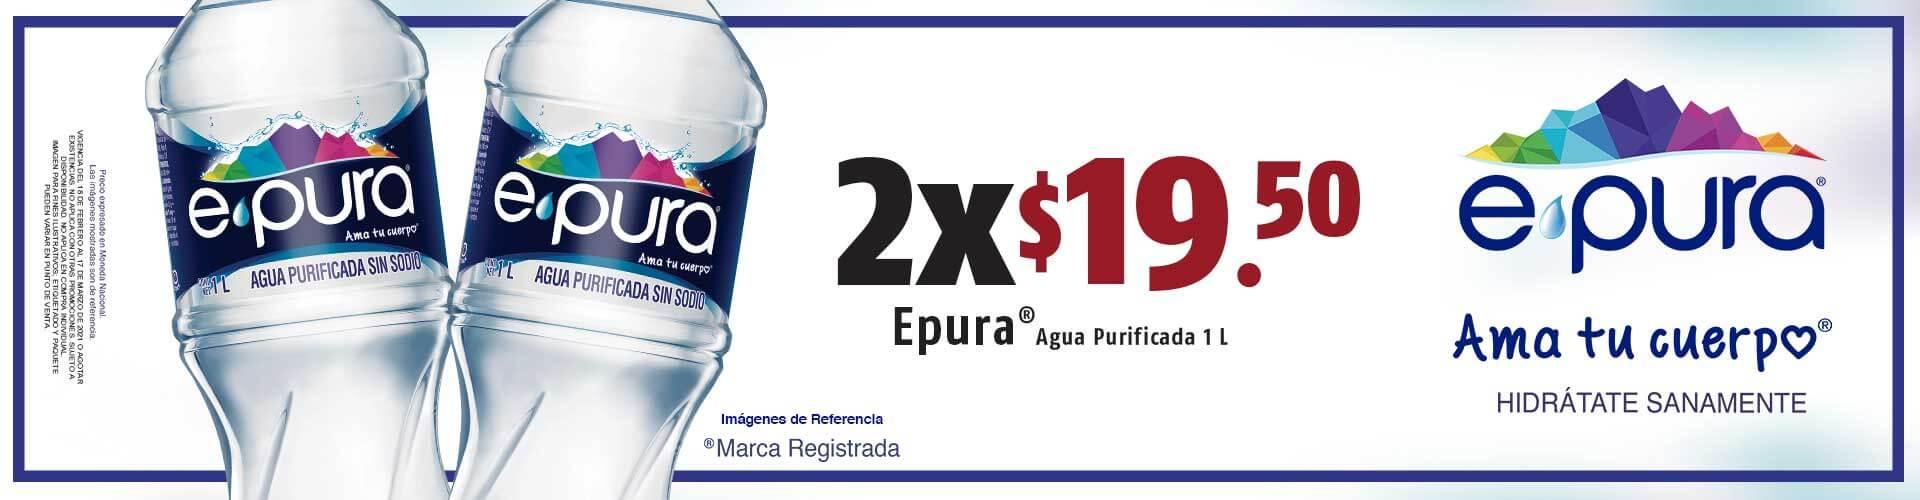 OXXO Home EPura P3 2021